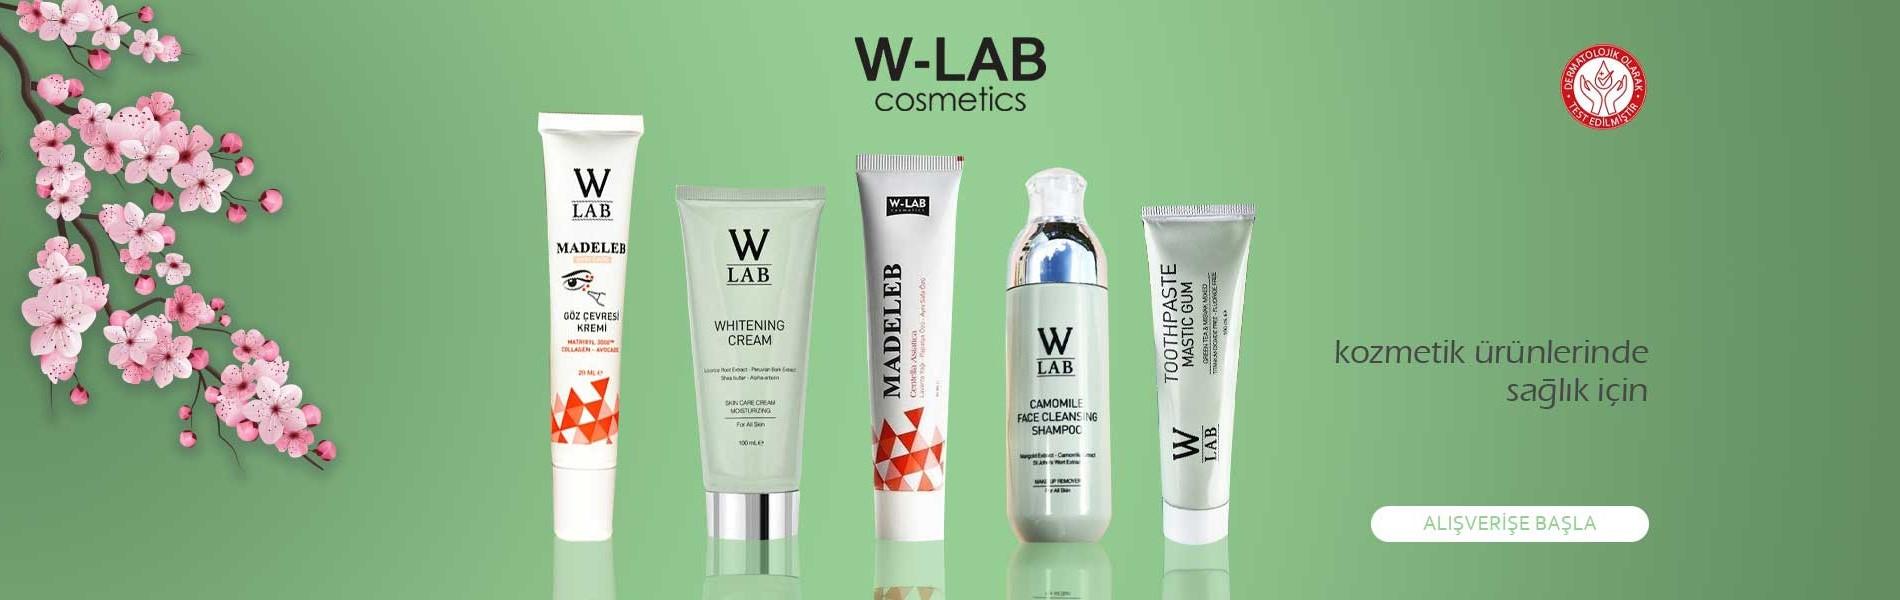 W-lab